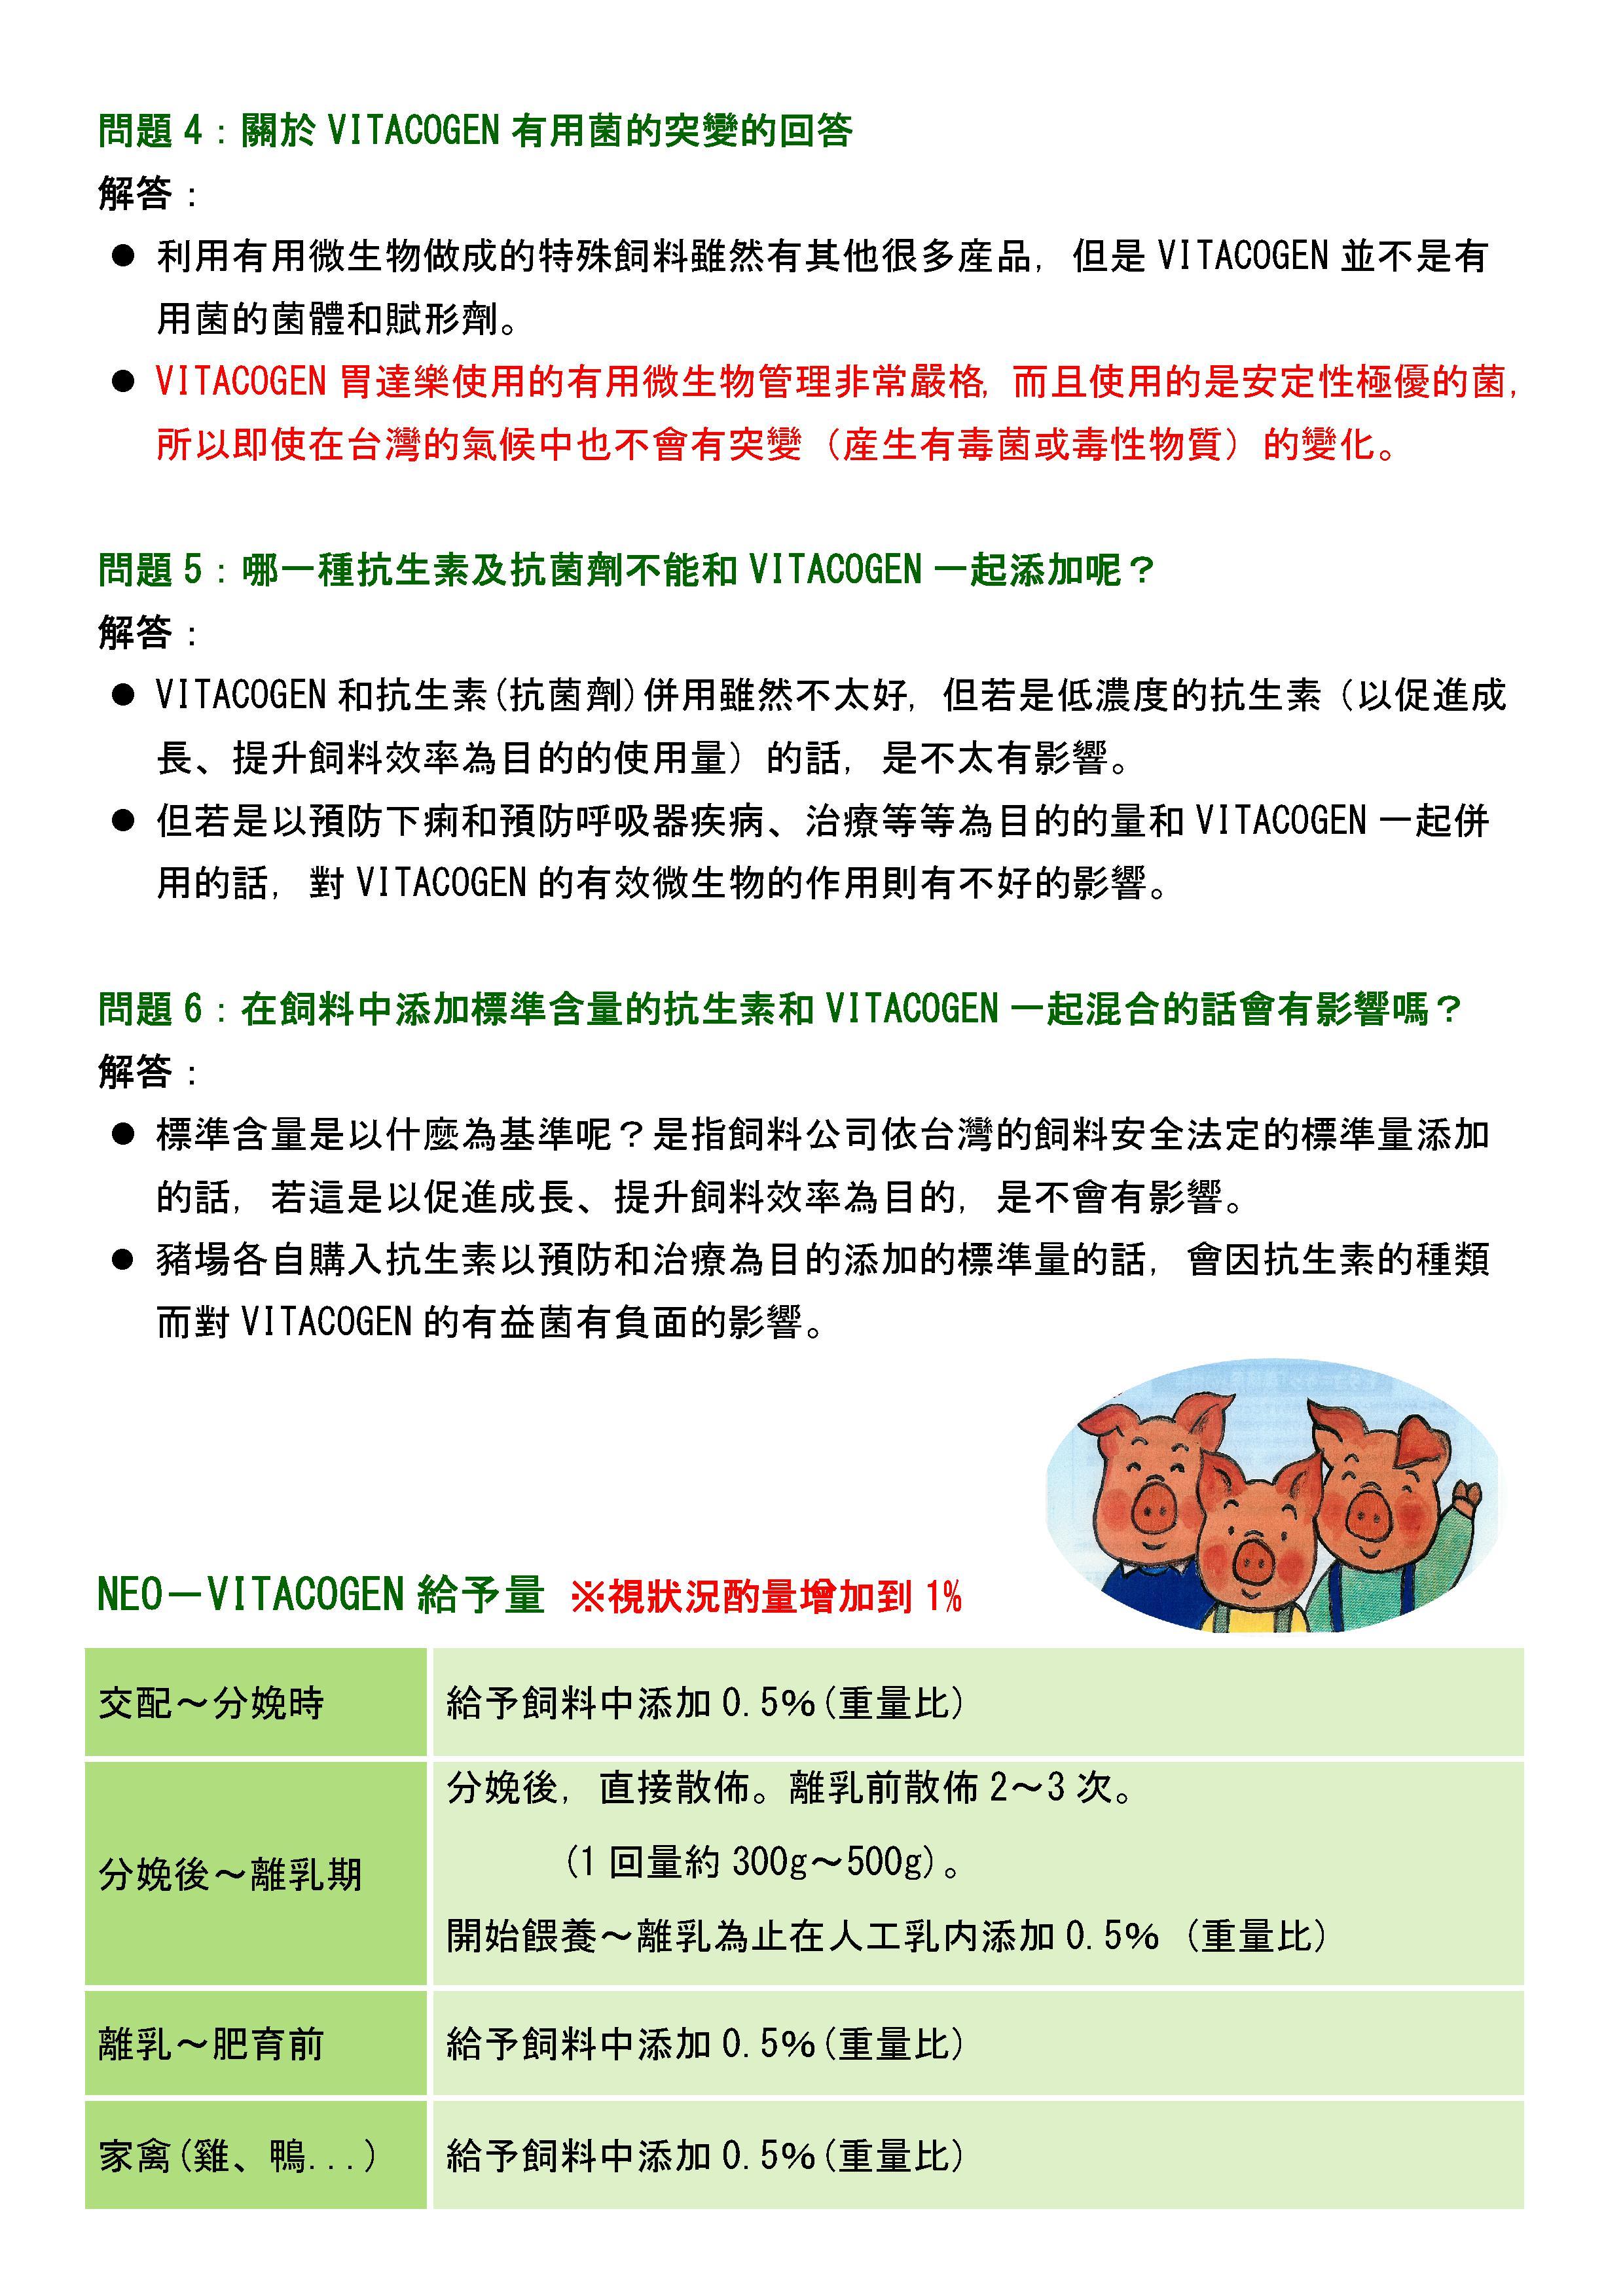 NEO+仔豬DM_20190125 (9)